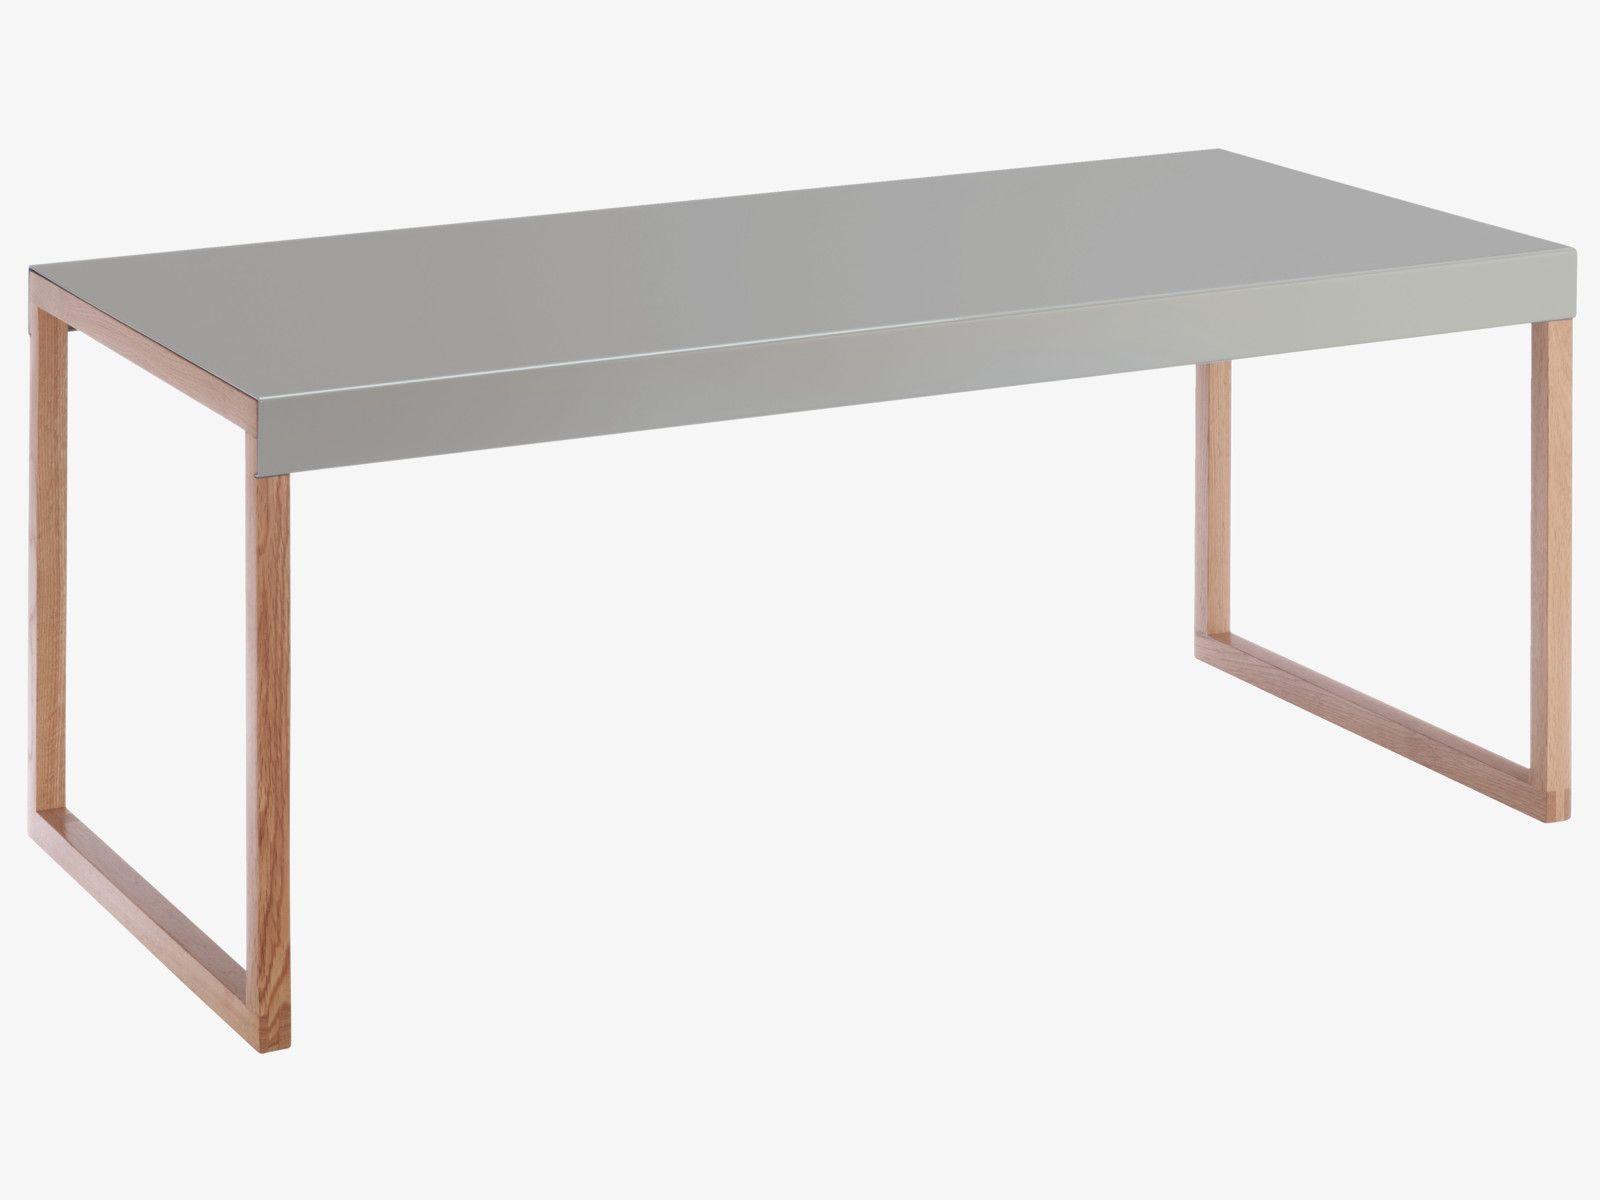 KILO GREYS Metal Grey metal coffee table HabitatUK £35